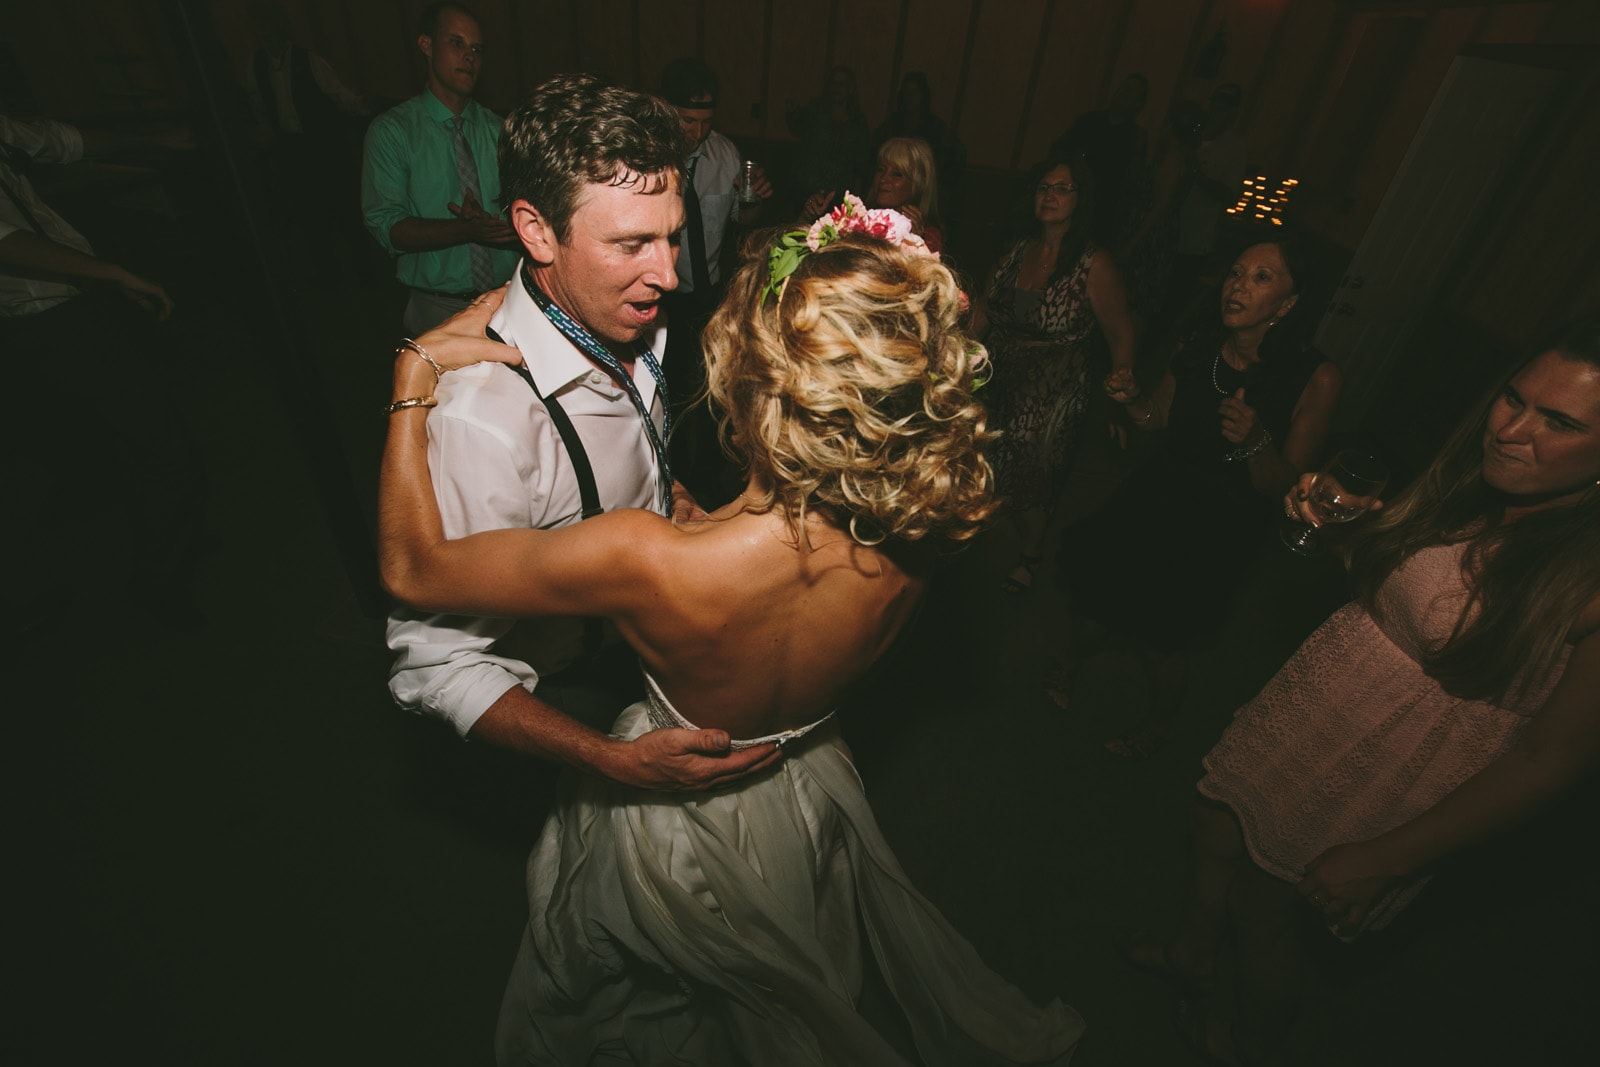 radonich_ranch_wedding_los_gatos_wedding_075